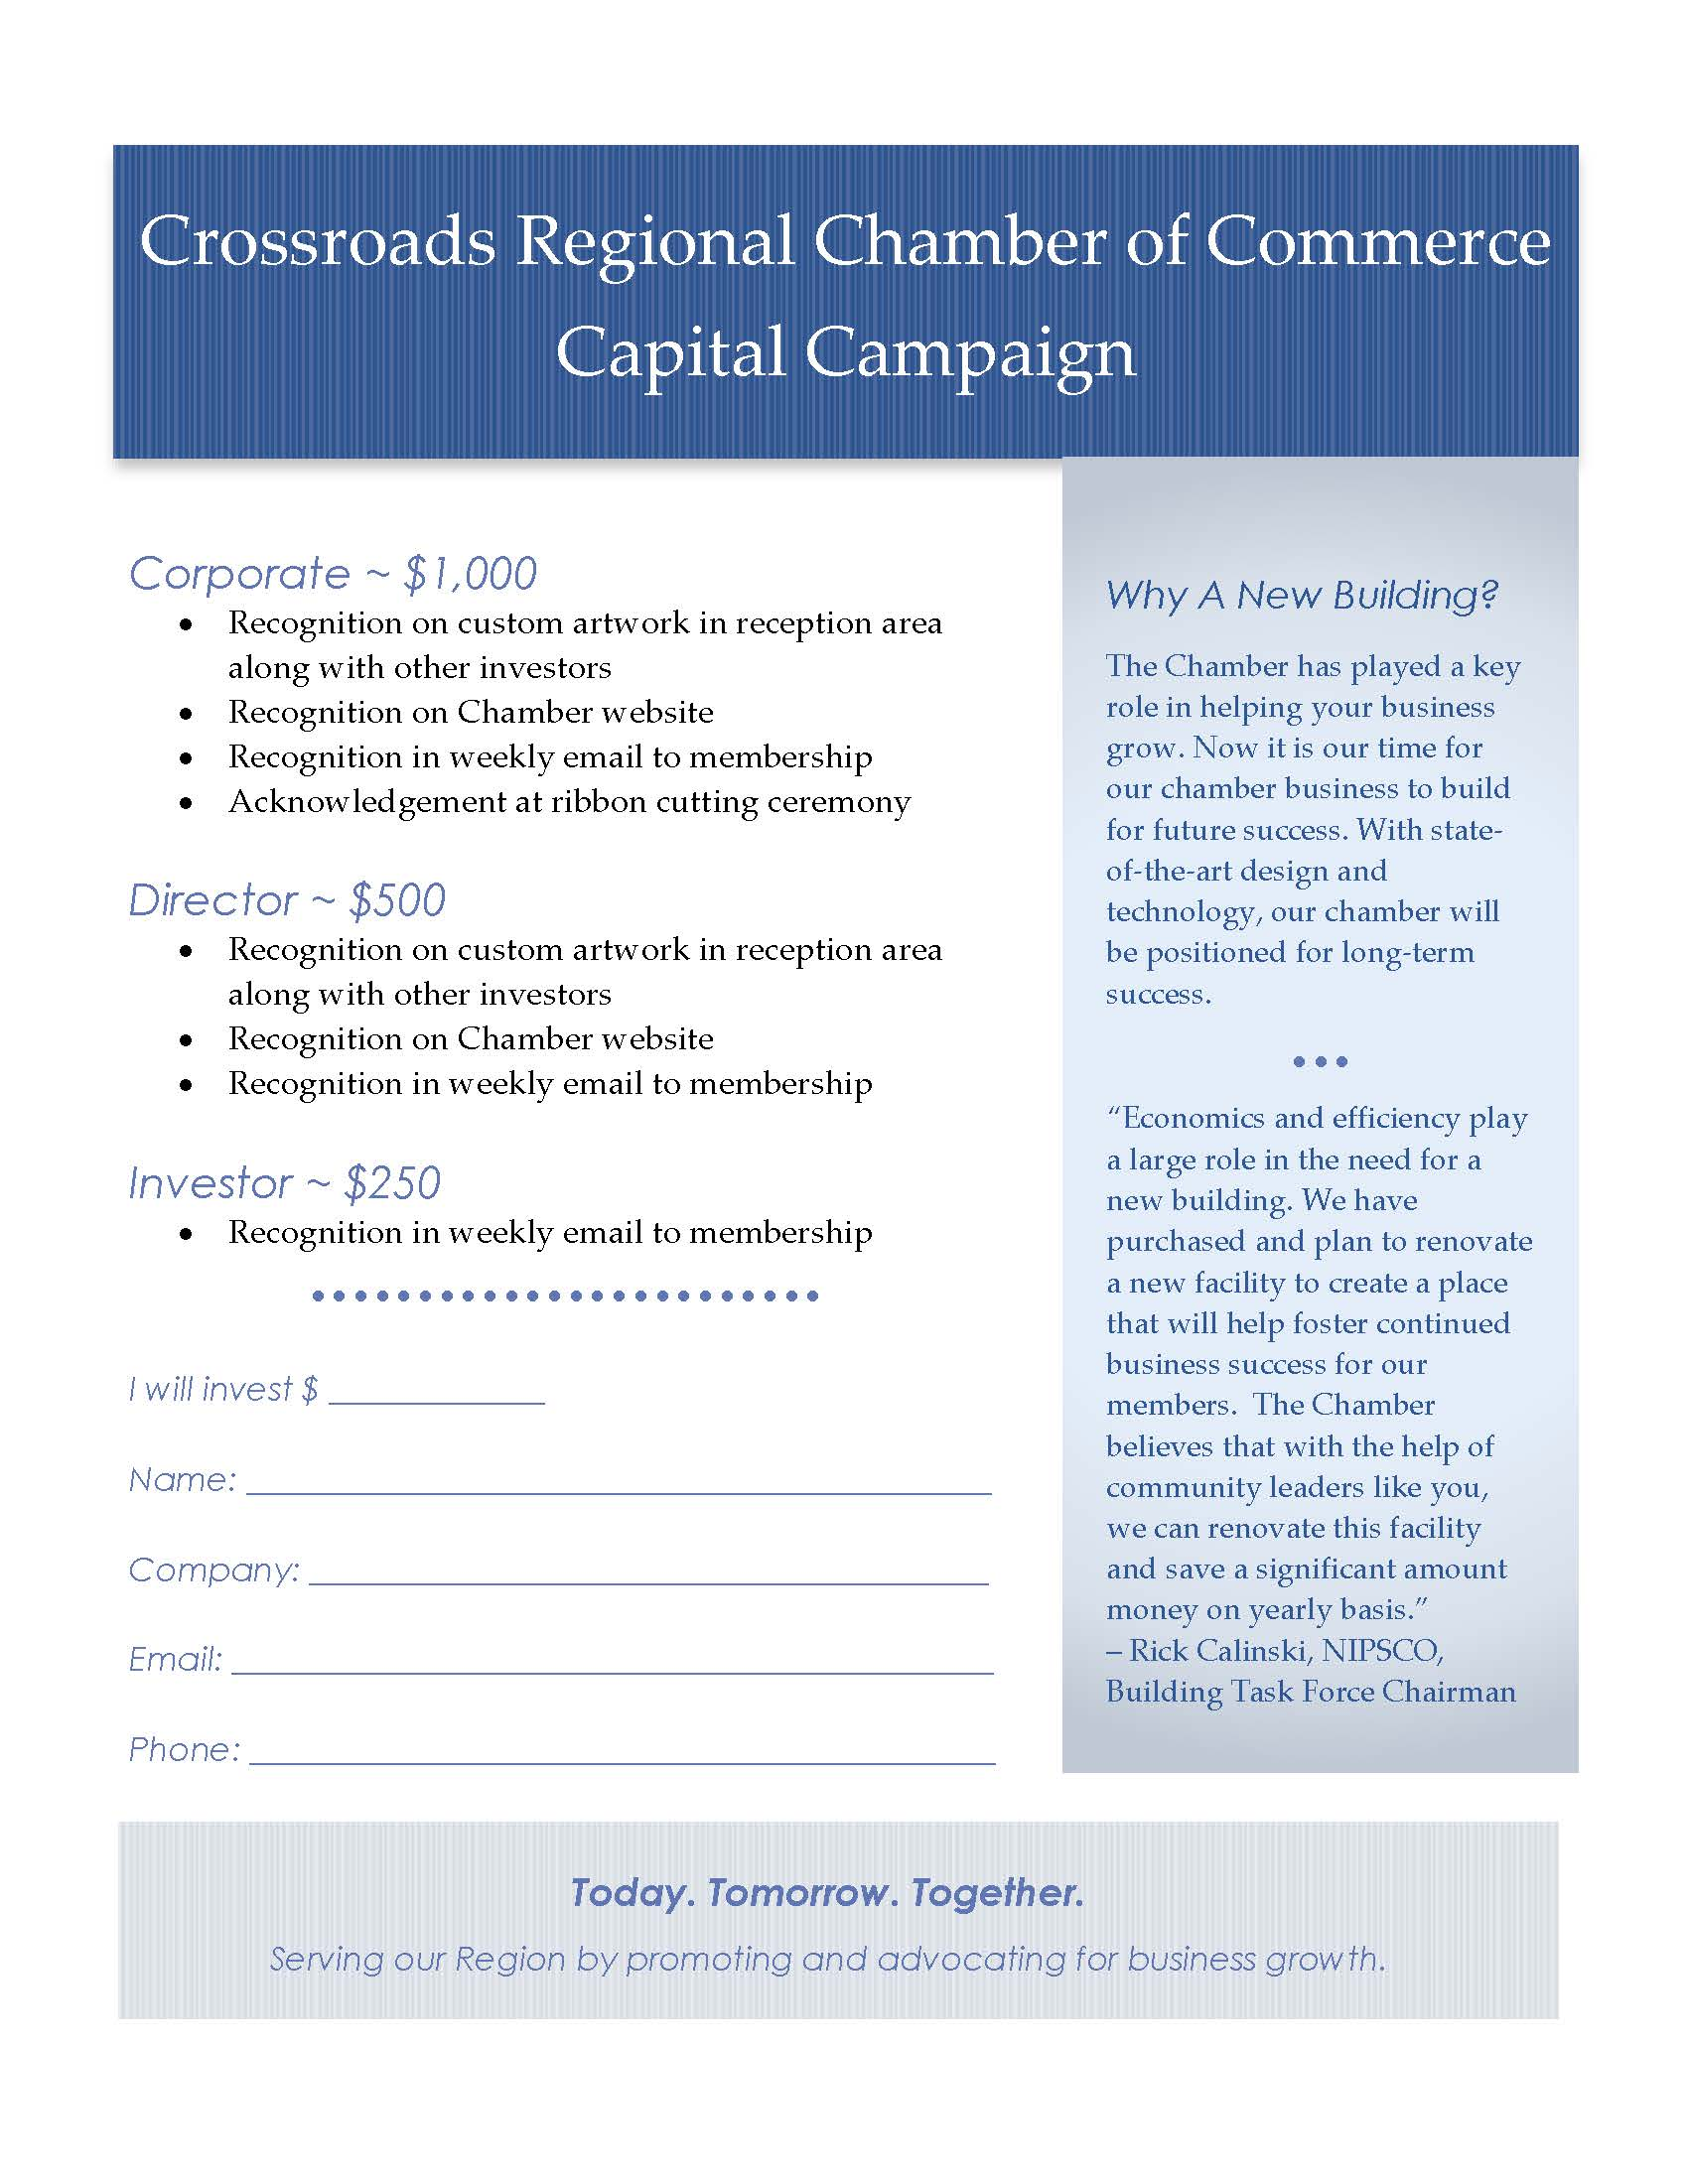 Capital-Campaign-Flyer.jpg